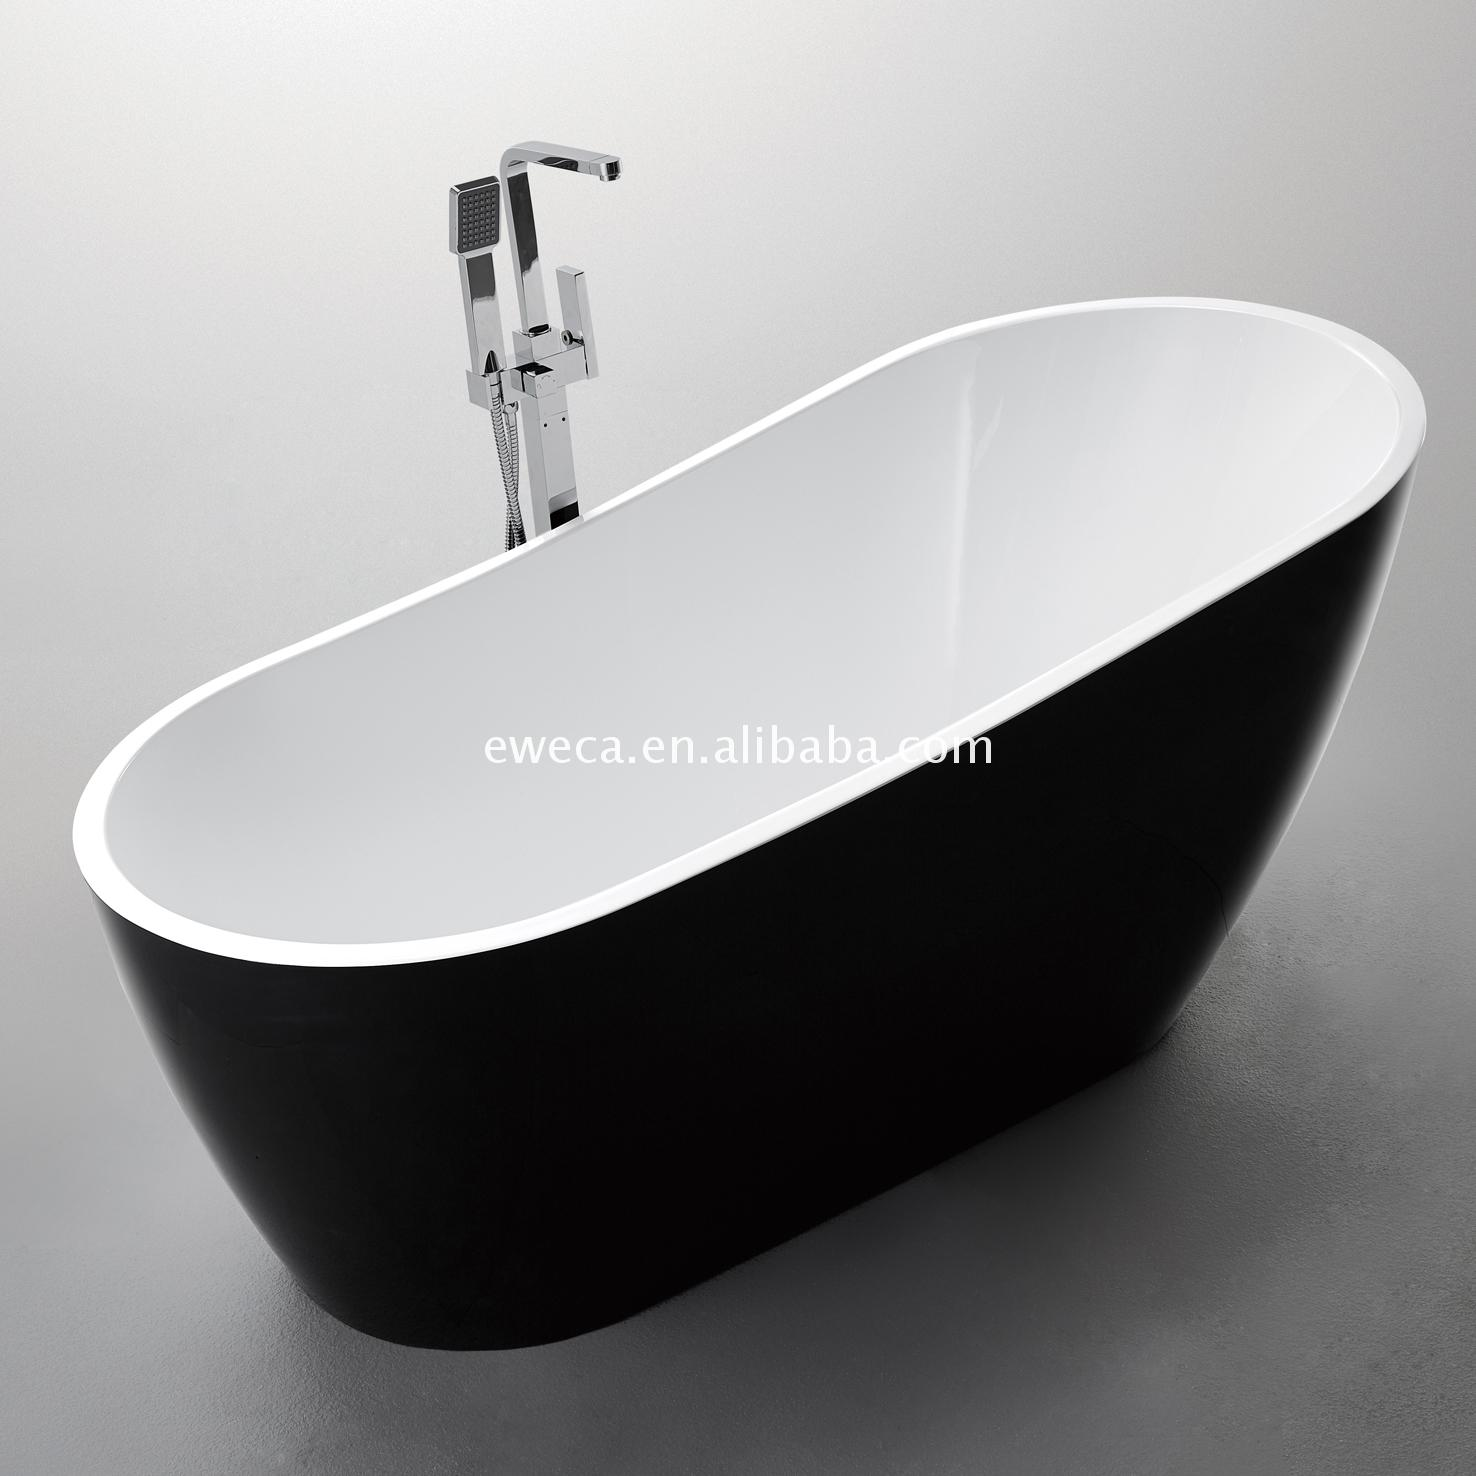 China massage bath manufacturers wholesale 🇨🇳 - Alibaba